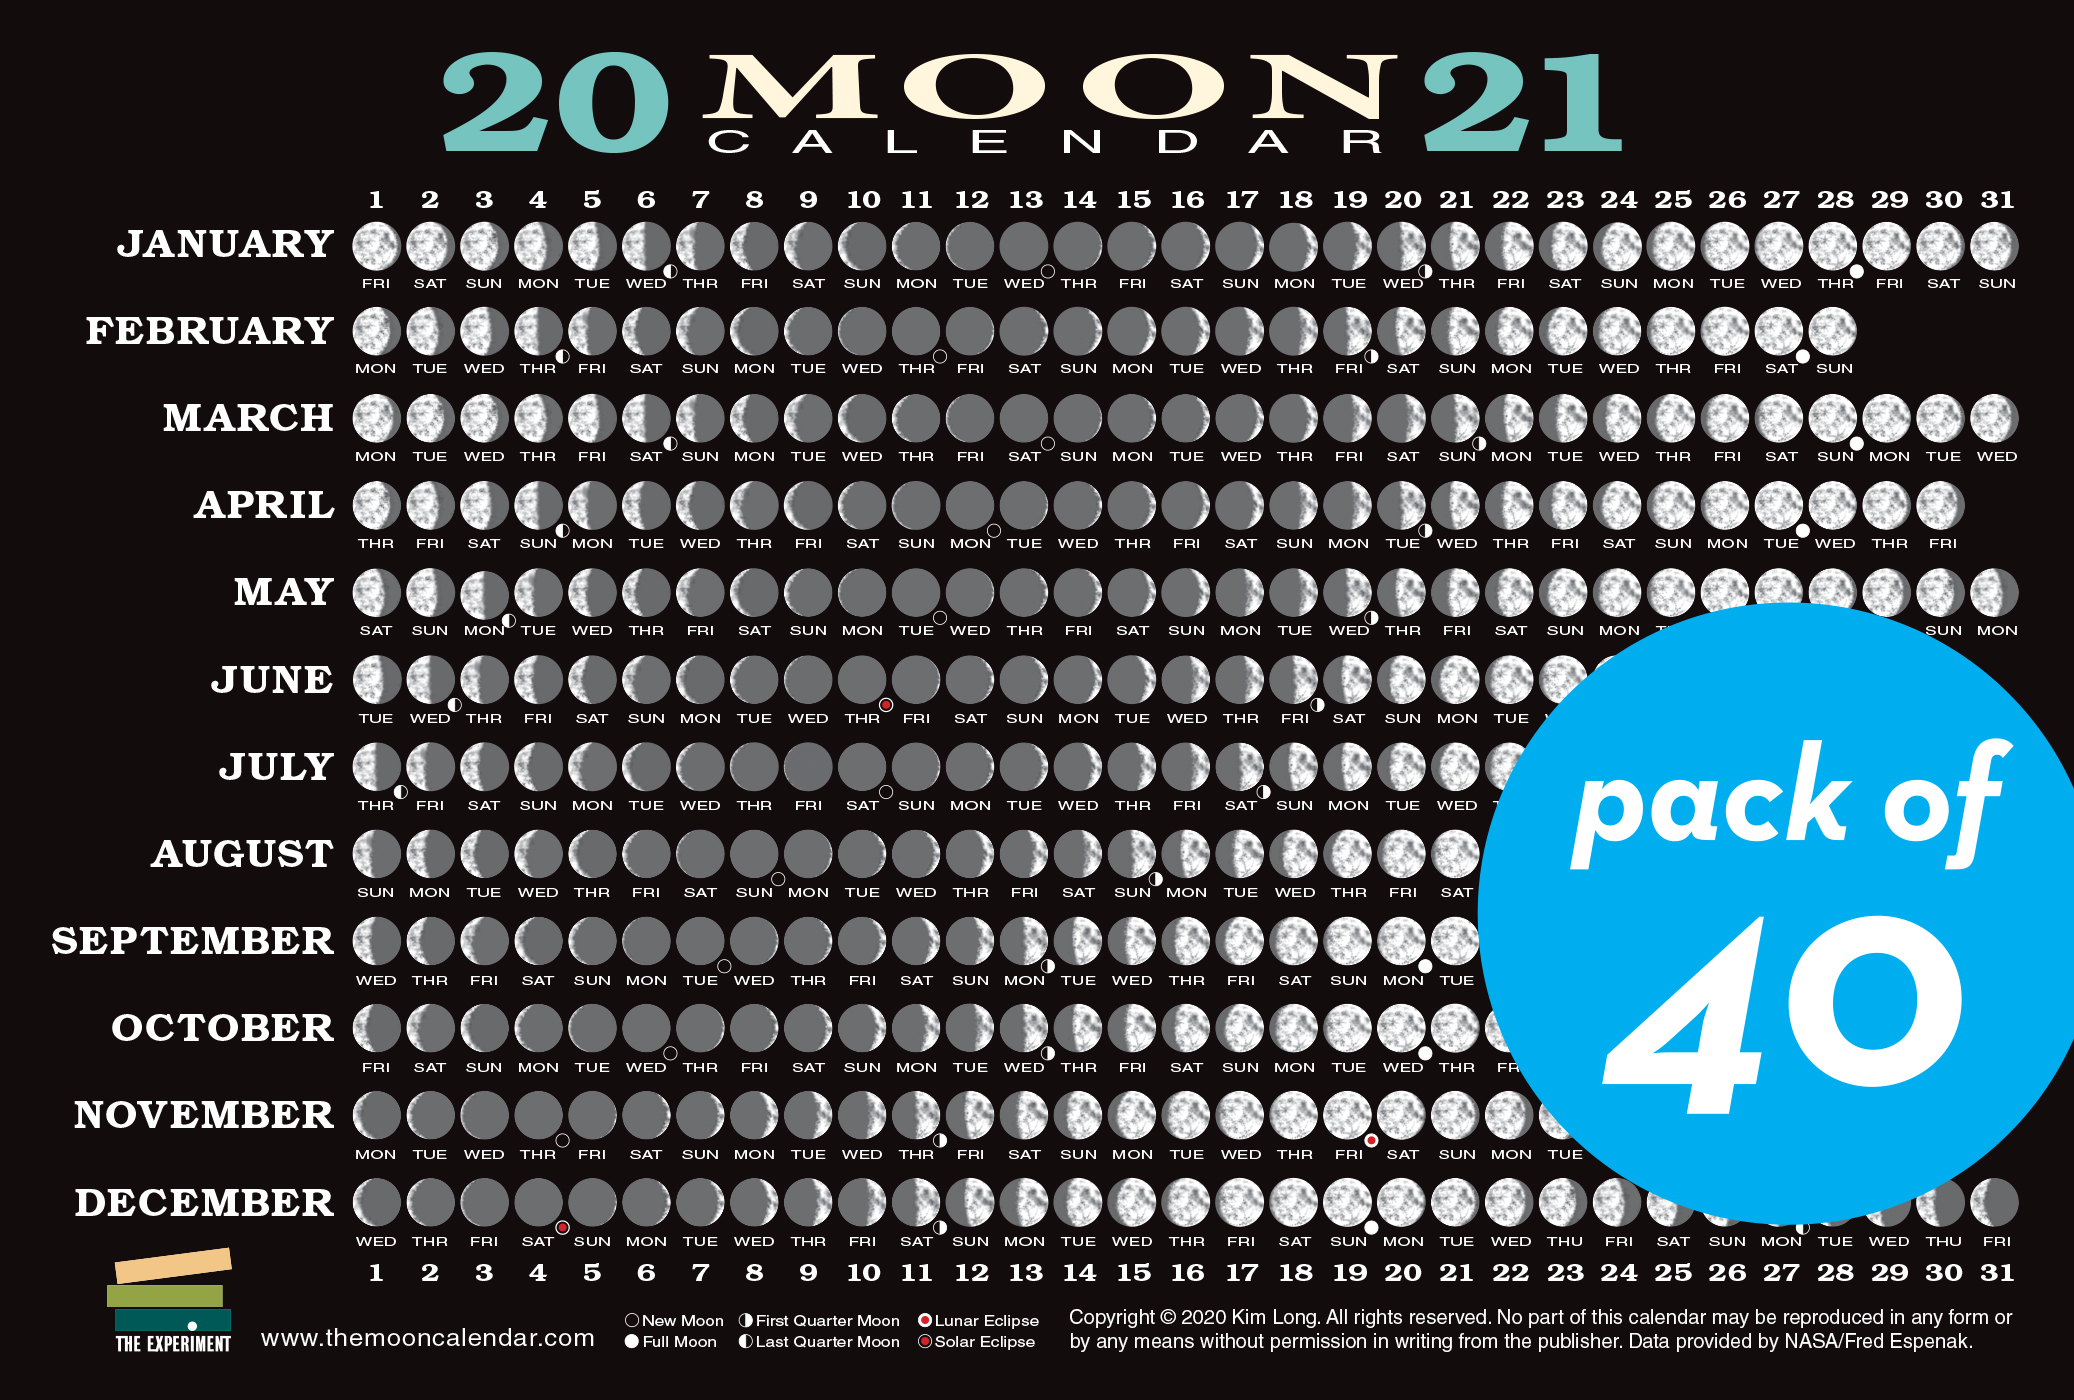 2021 Moon Calendar Card (40 pack)